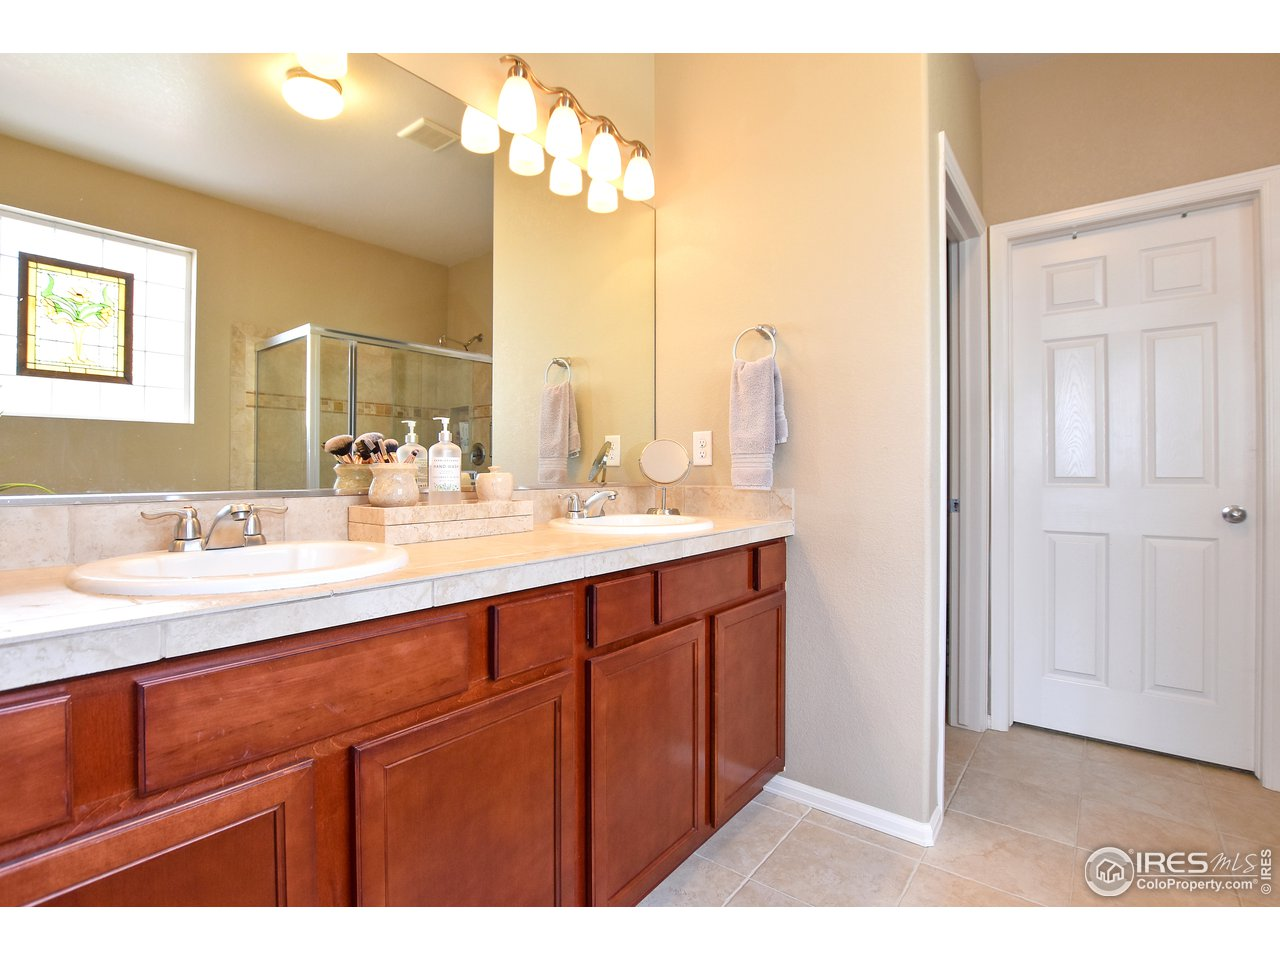 Double vanity and tile floors!